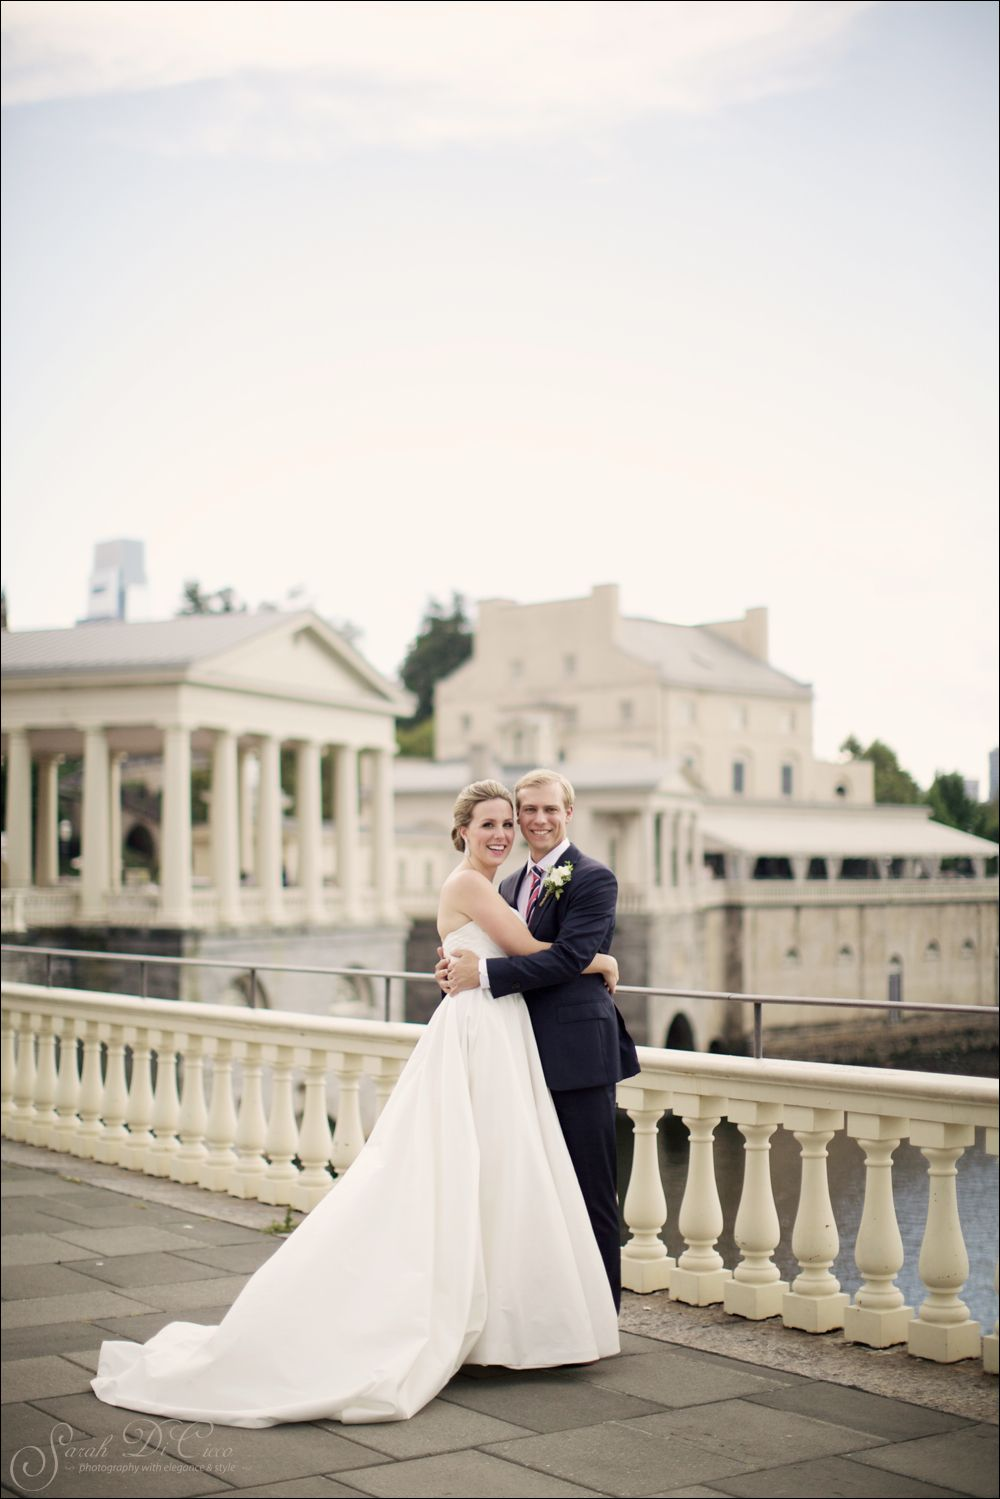 Happily Ever After Cait Mike 9 6 14 Philadelphia Wedding Wedding Pics Bride Blog